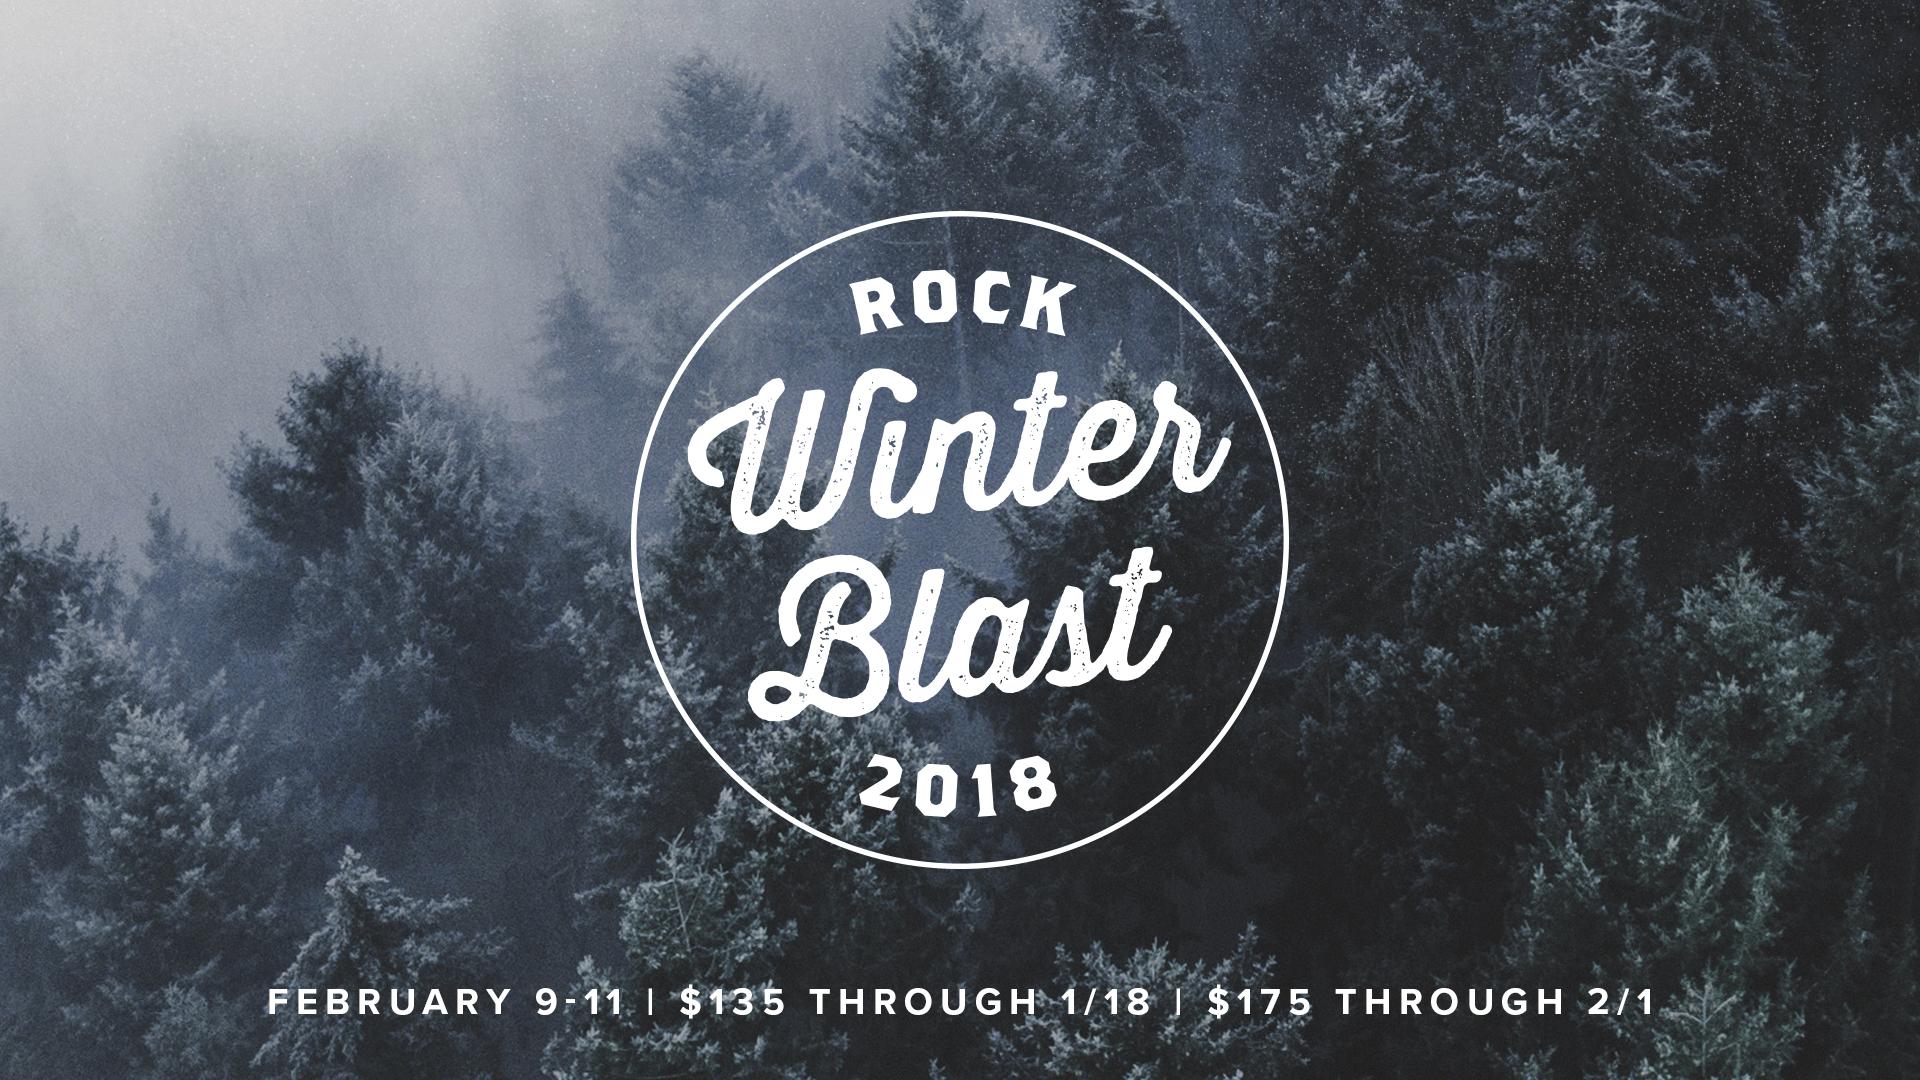 Rockwinterblast2018 slide copy